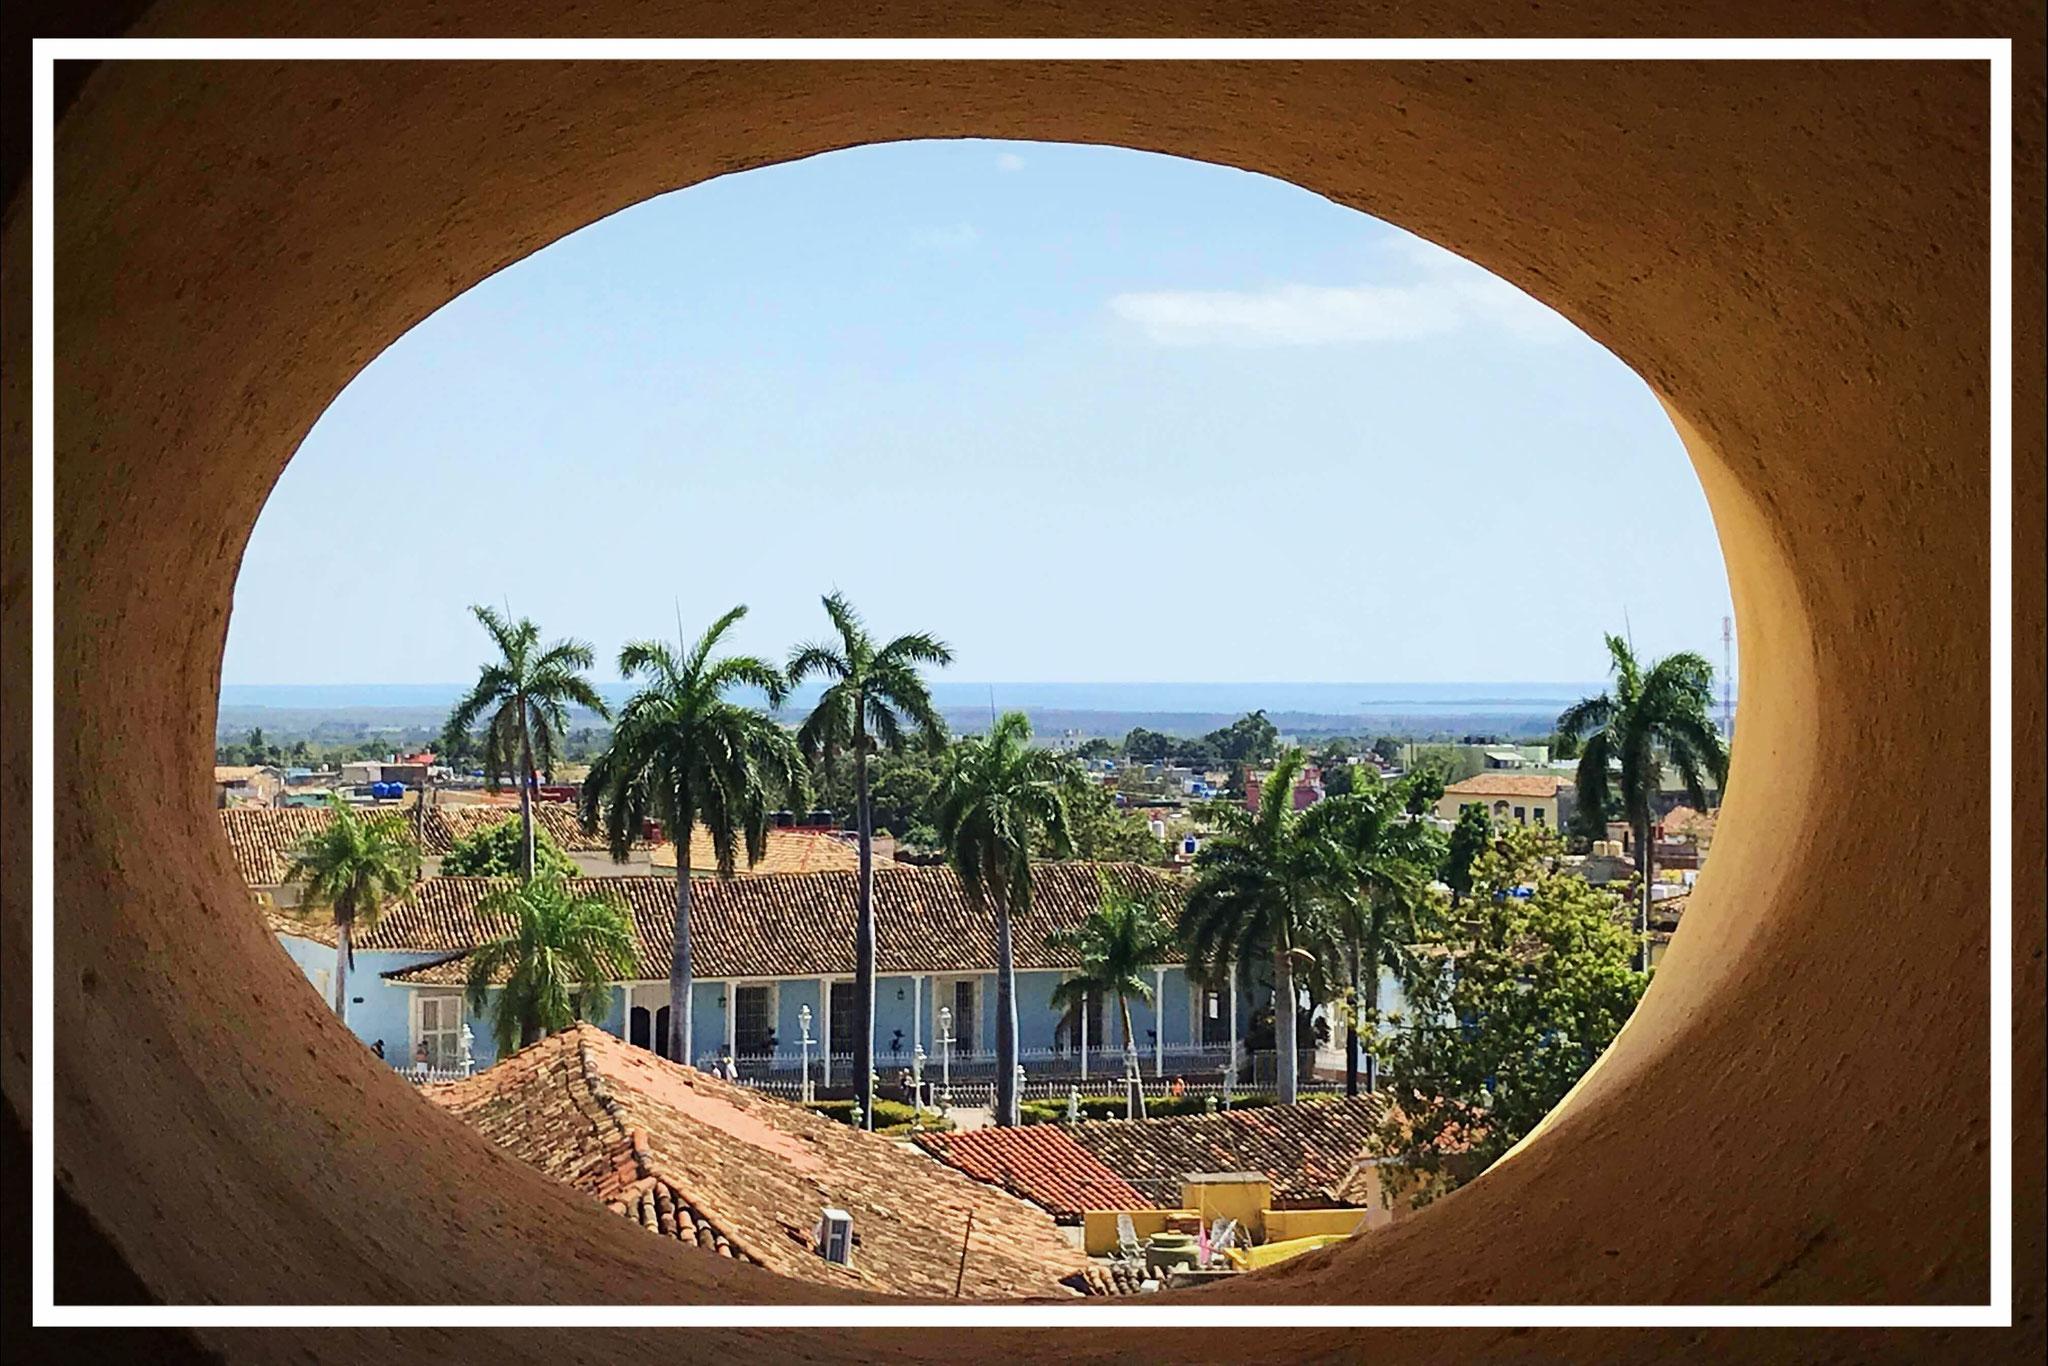 Blick aus dem Glockenturm des ehemaligen Franziskanerklosters